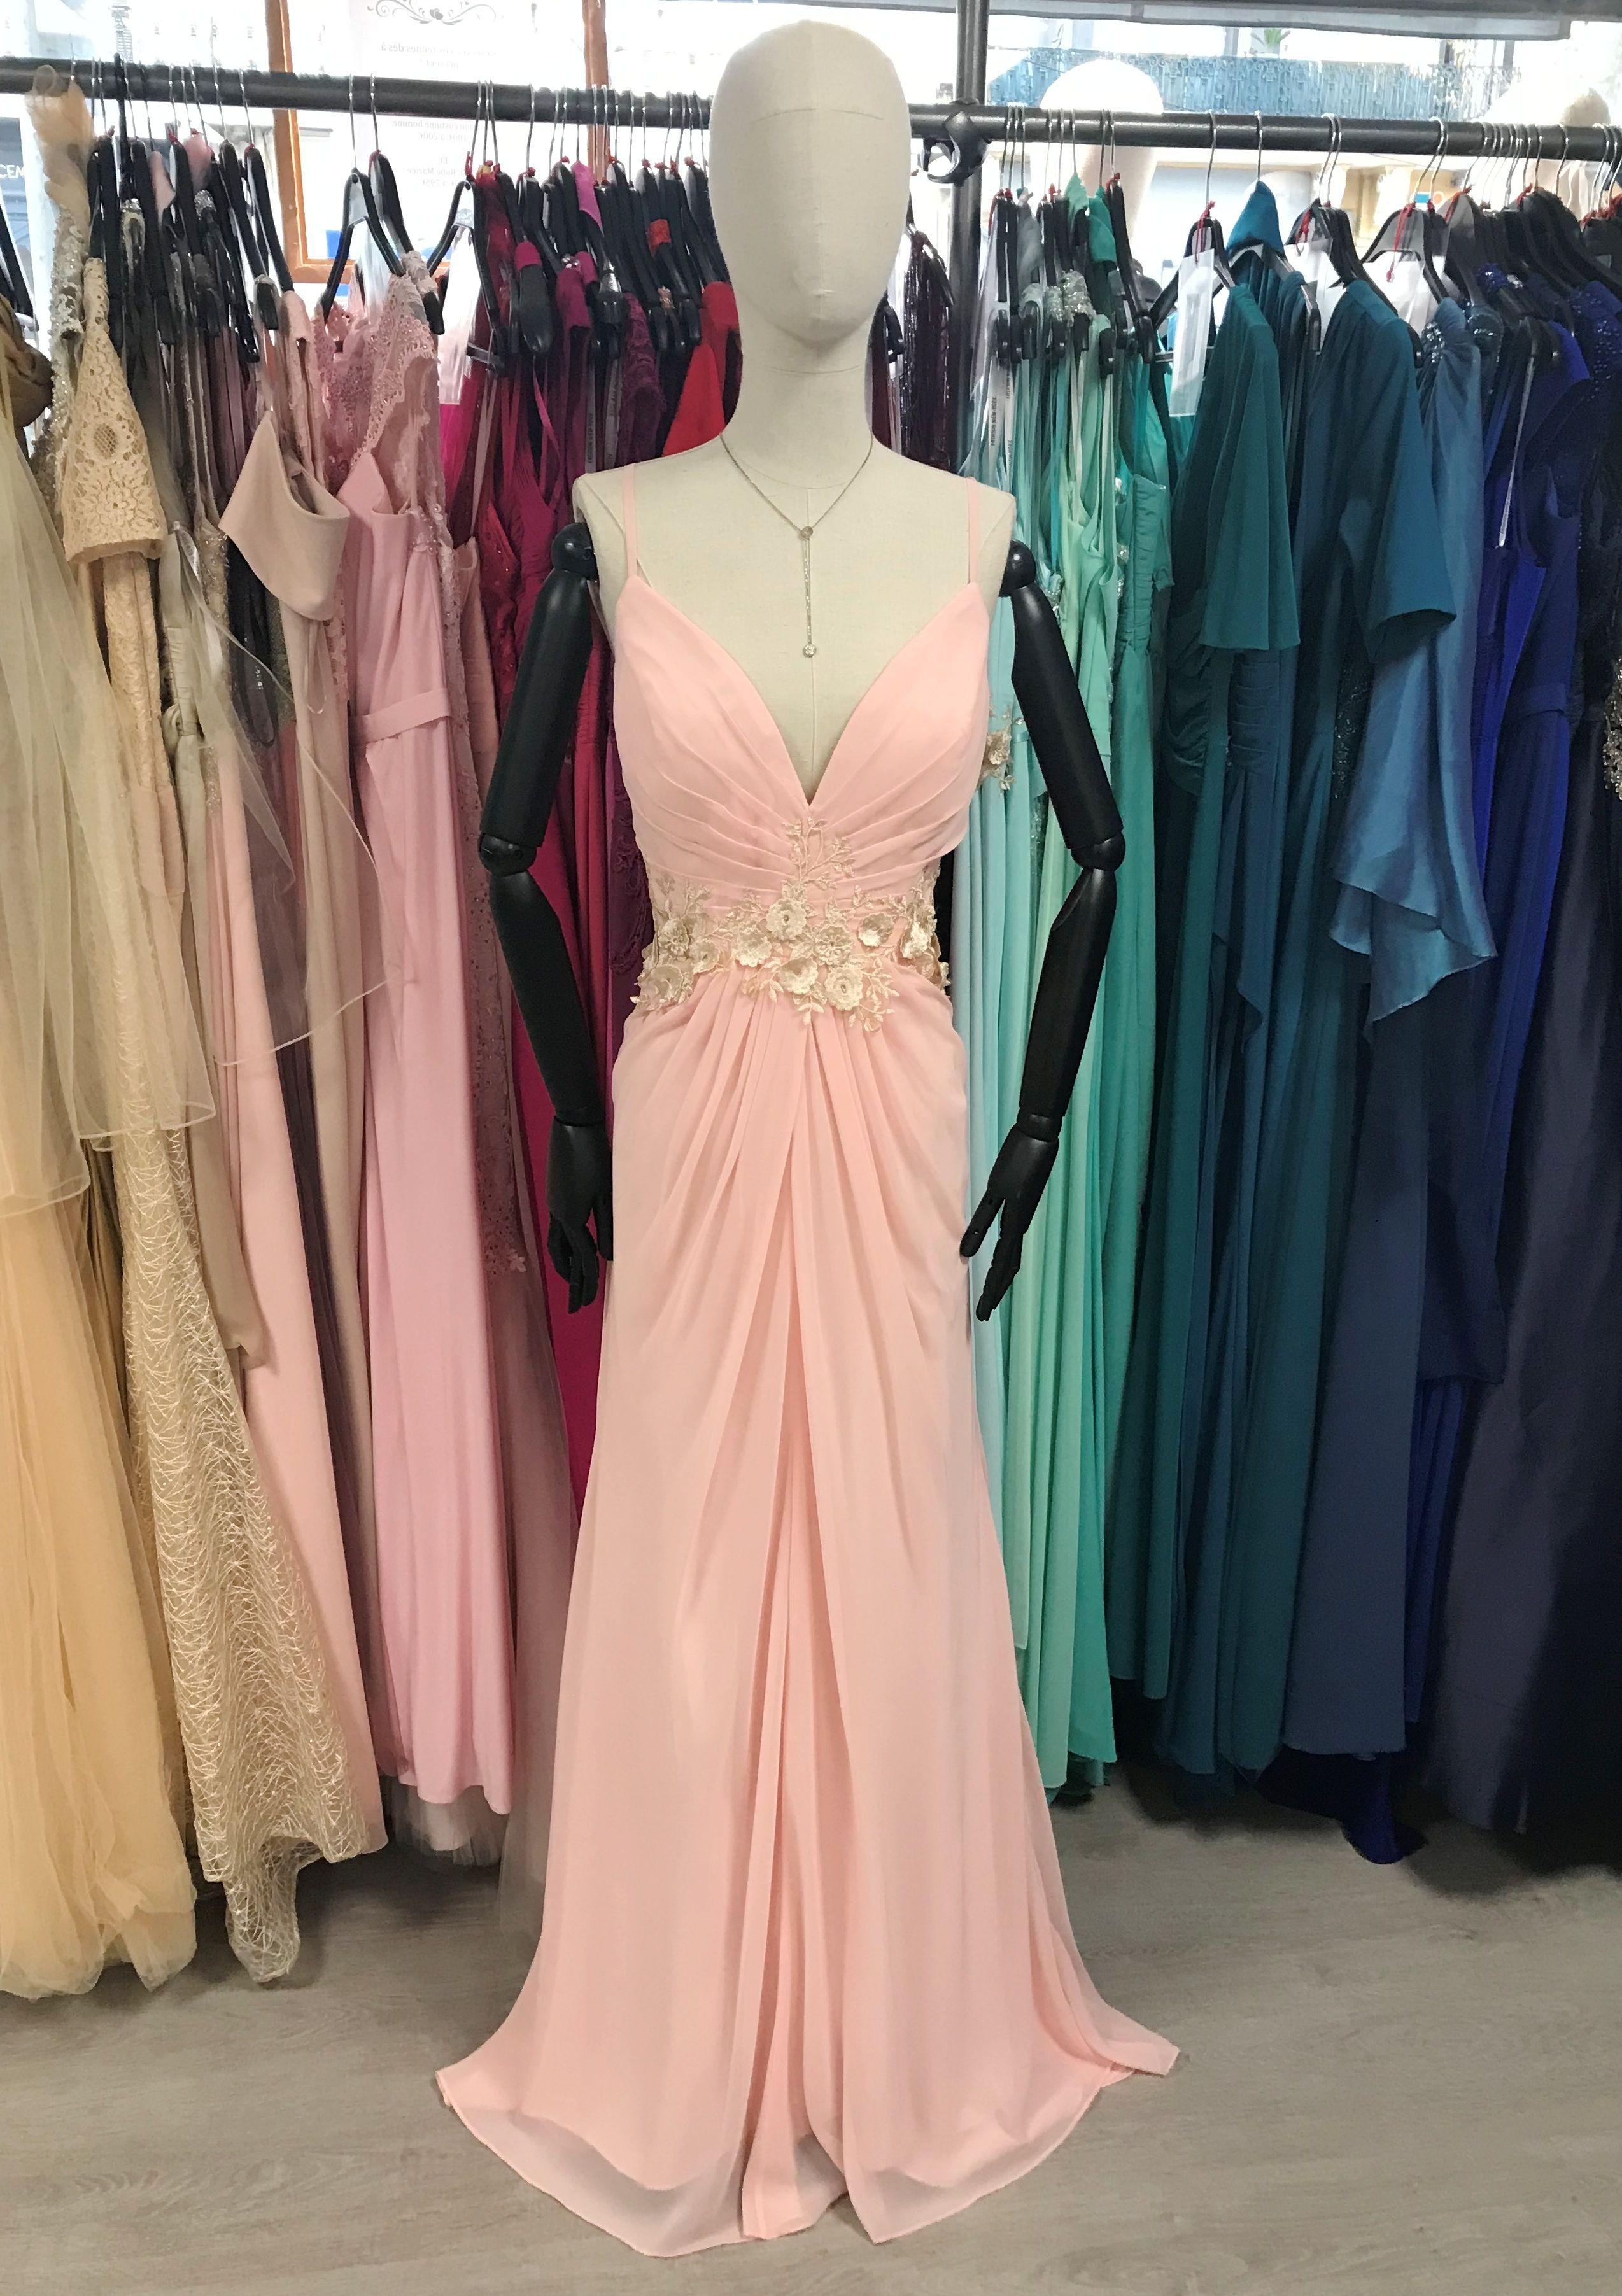 Robe Longue Rose Poudree Et Beige Nude Decollete En V Et Forme